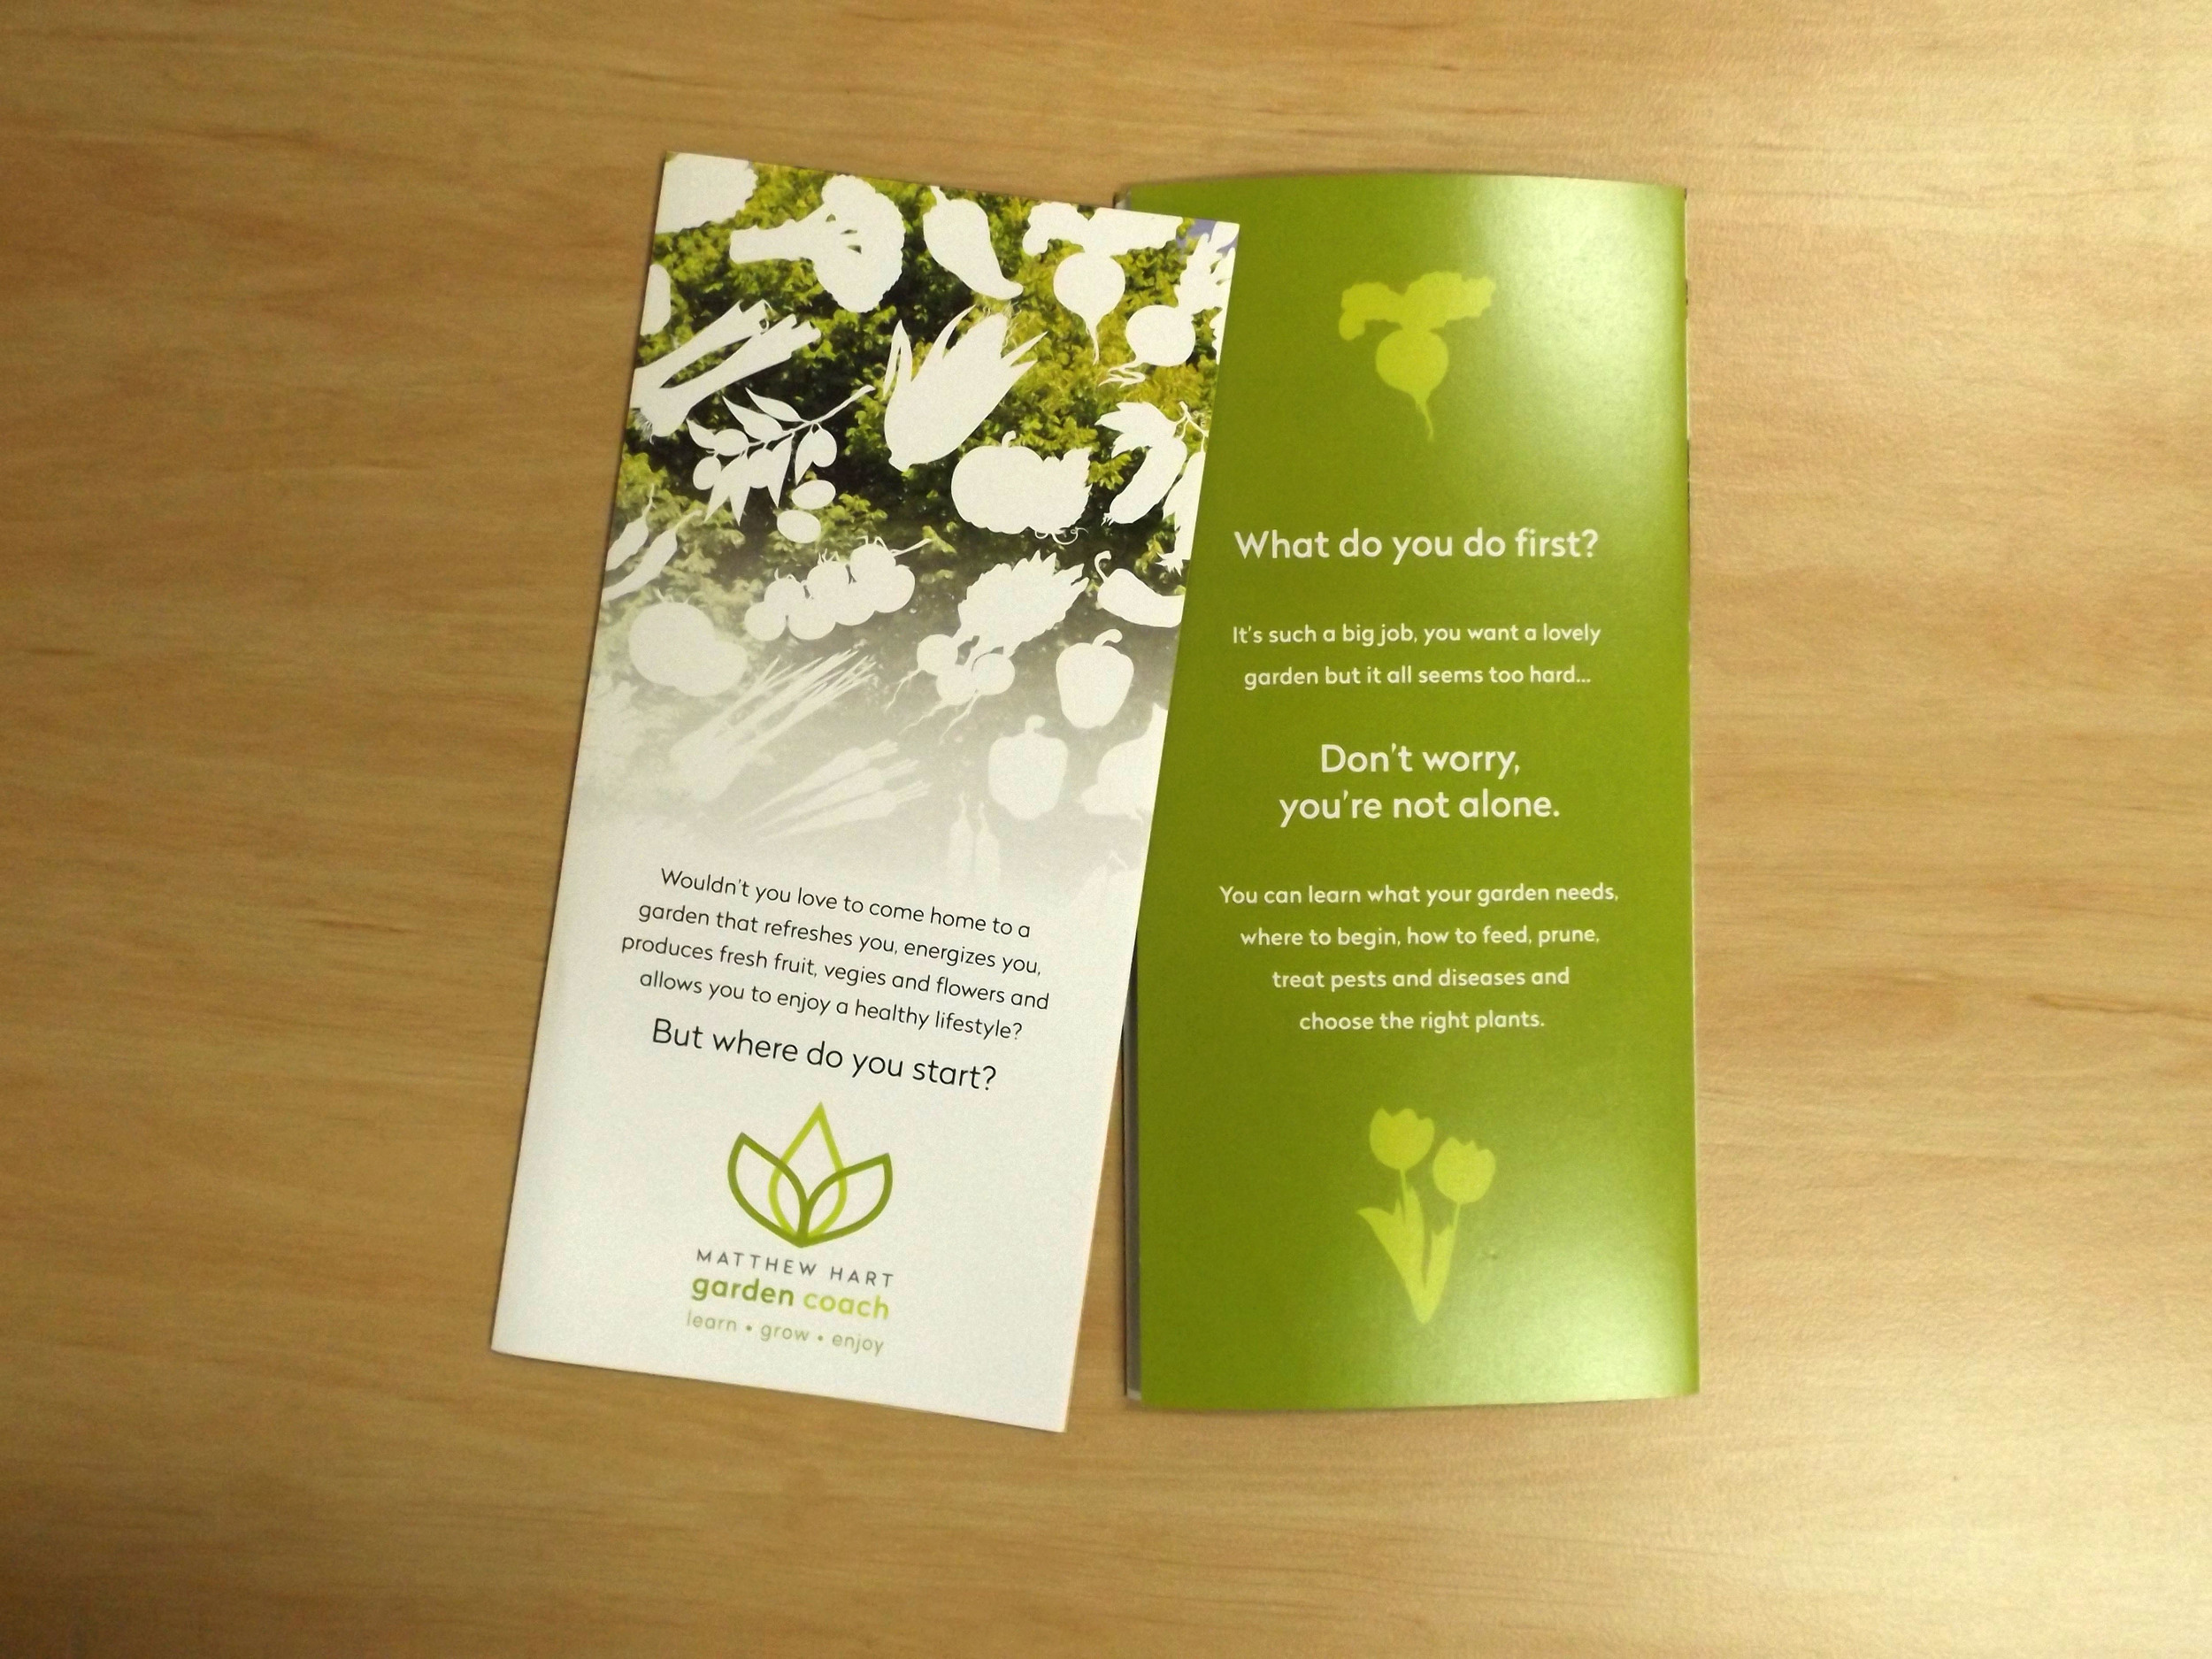 MATTHEW HART GARDEN COACH - Eco Brochure Design and Printing Geelong